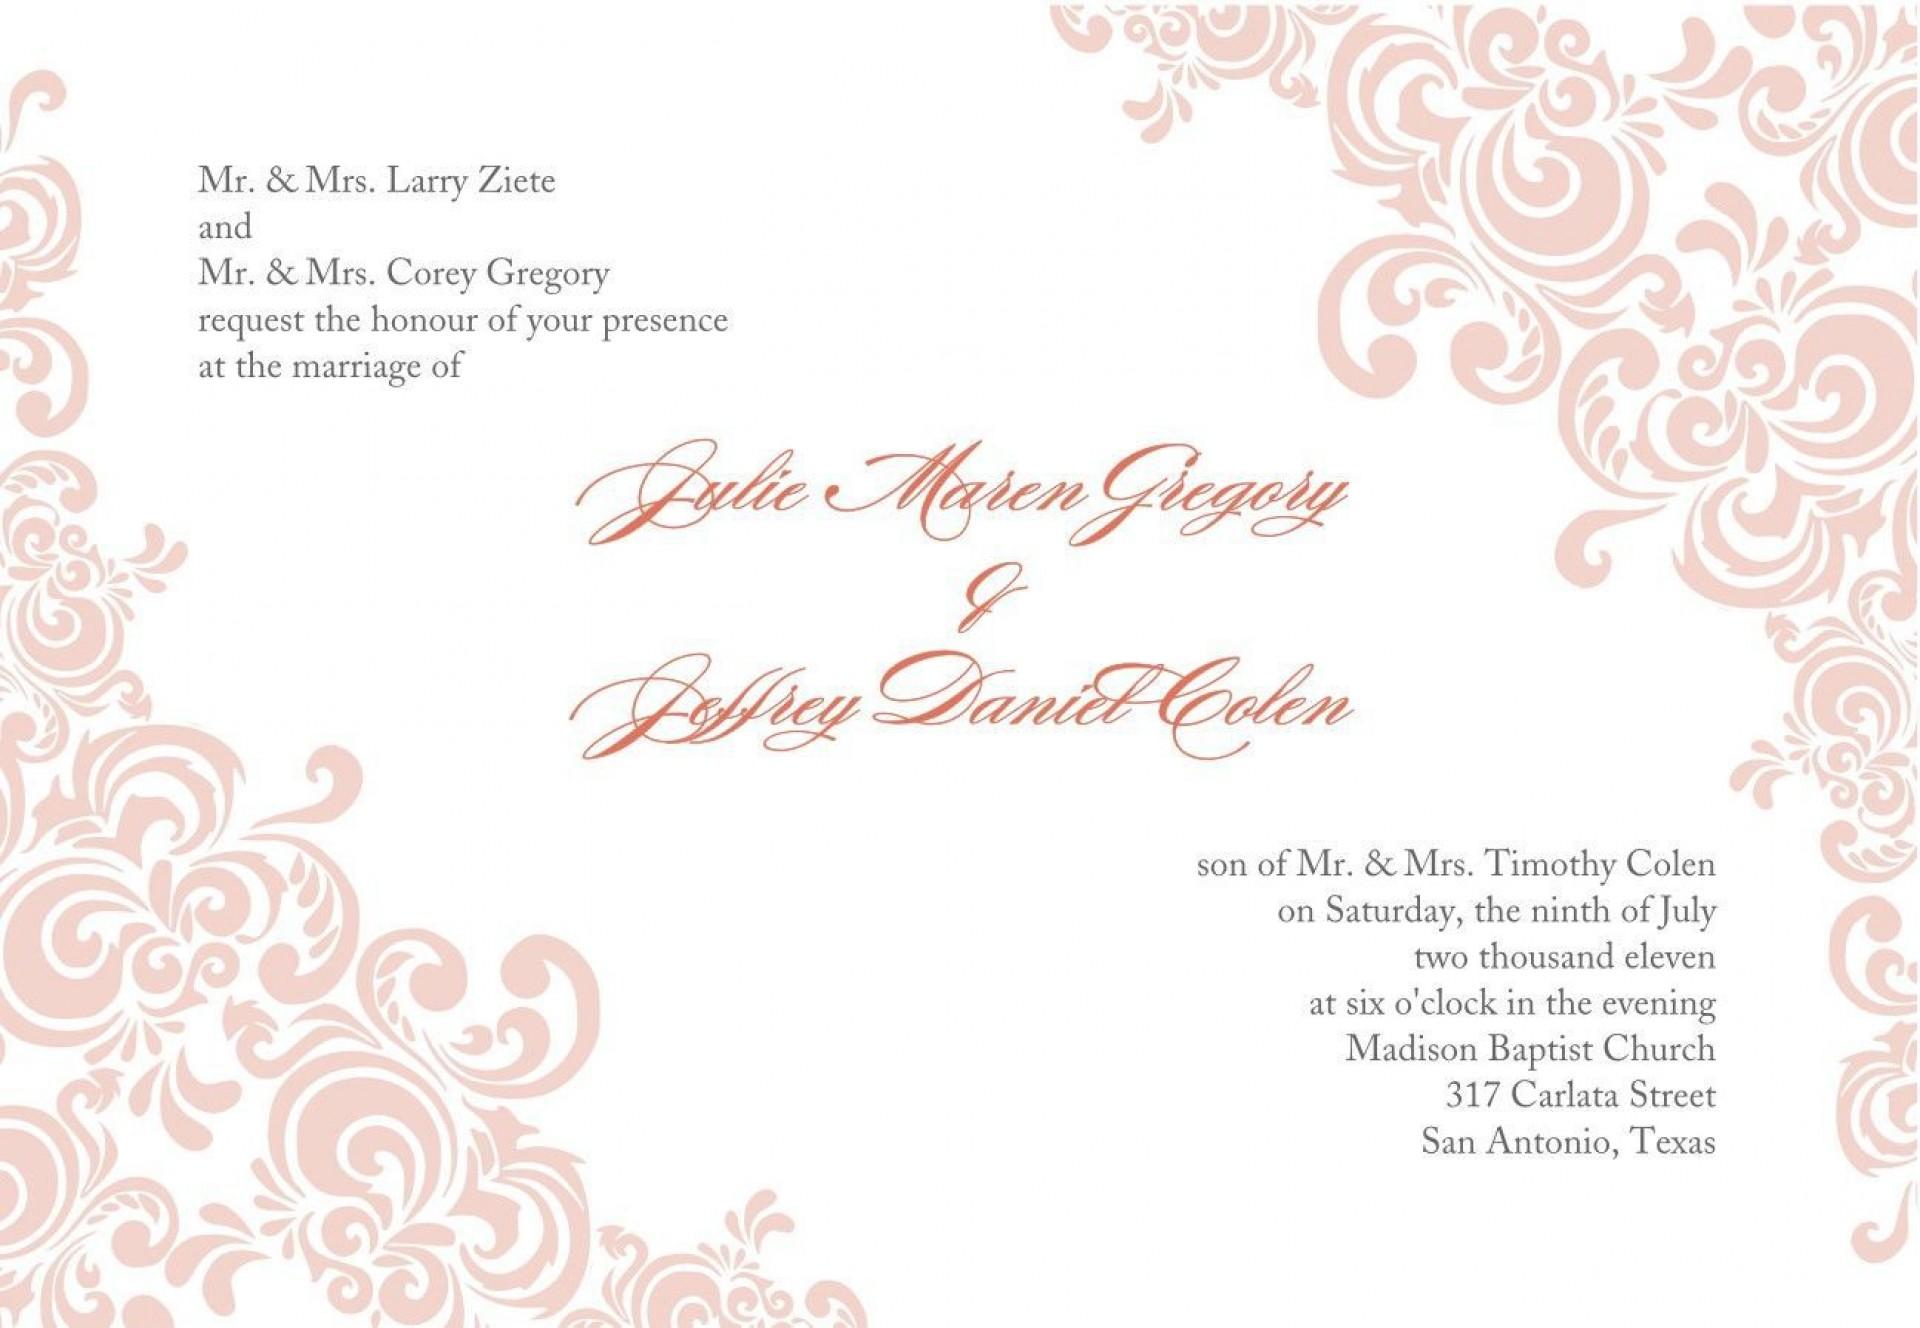 005 Stirring Formal Wedding Invitation Template Free Highest Quality 1920